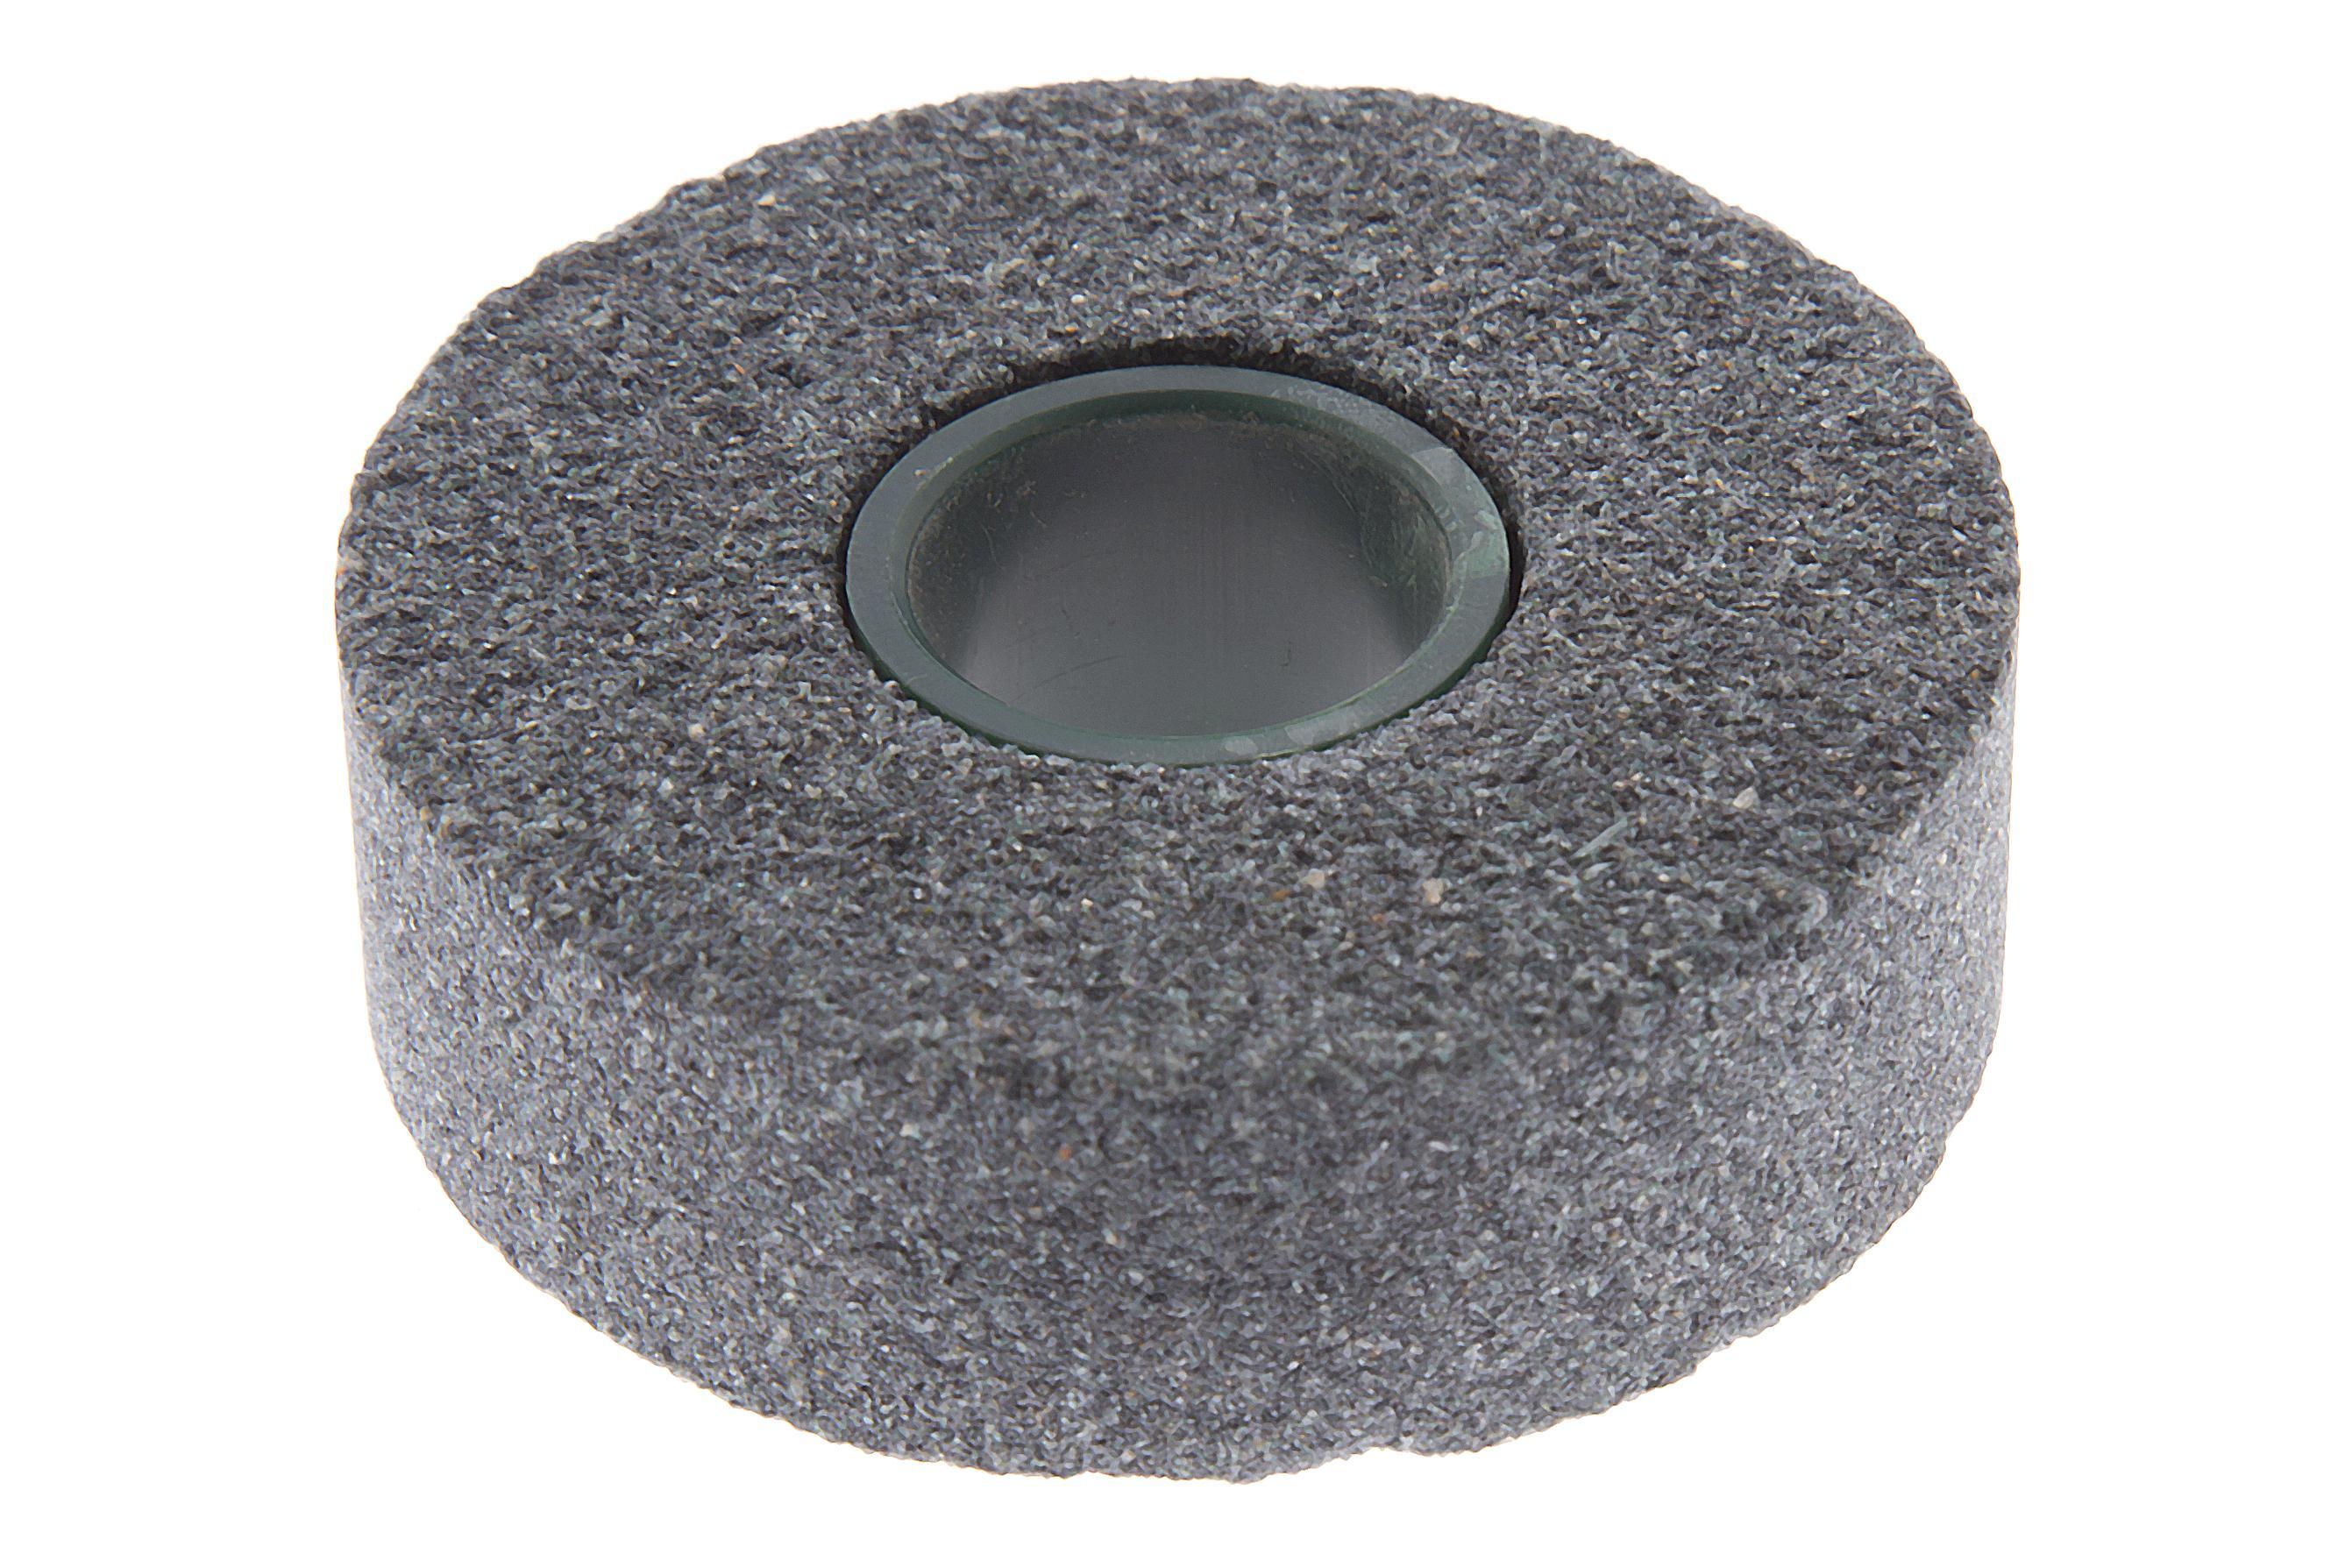 Круг шлифовальный ЛУГА-АБРАЗИВ 1 63 Х 20 Х 20 63С 60 k,l (25СМ) ваза mughal l 20 х 20 х 30 см